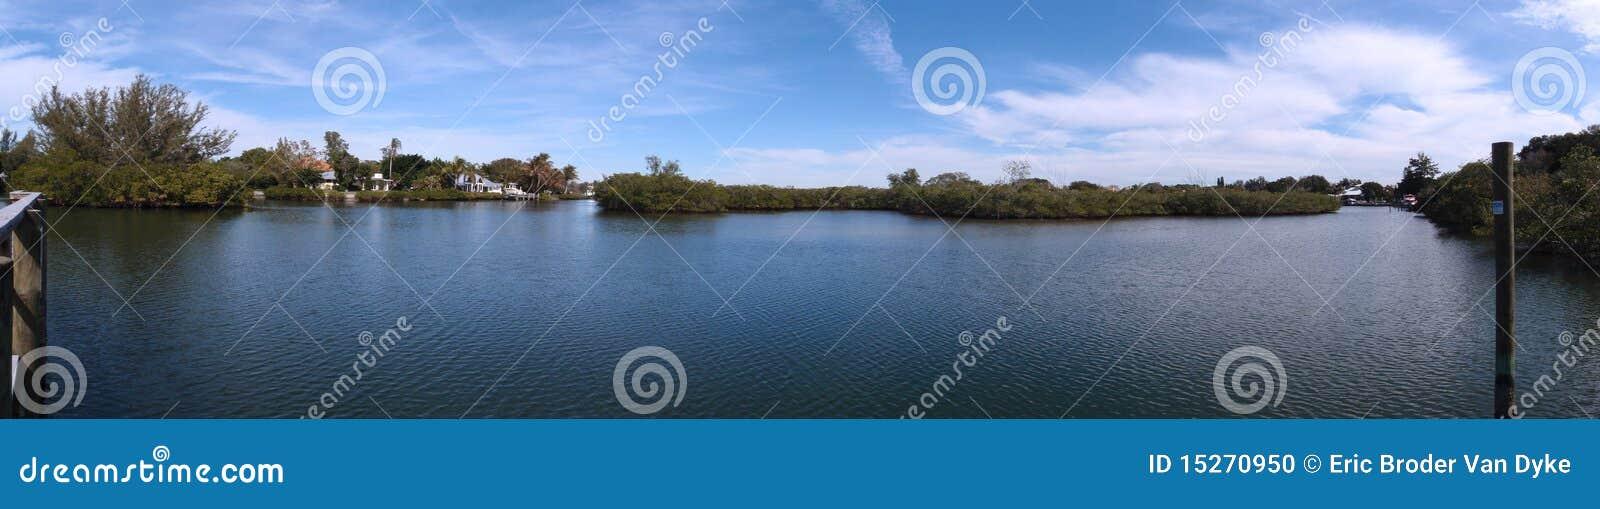 Områdeskanalen keys paroramic siesta